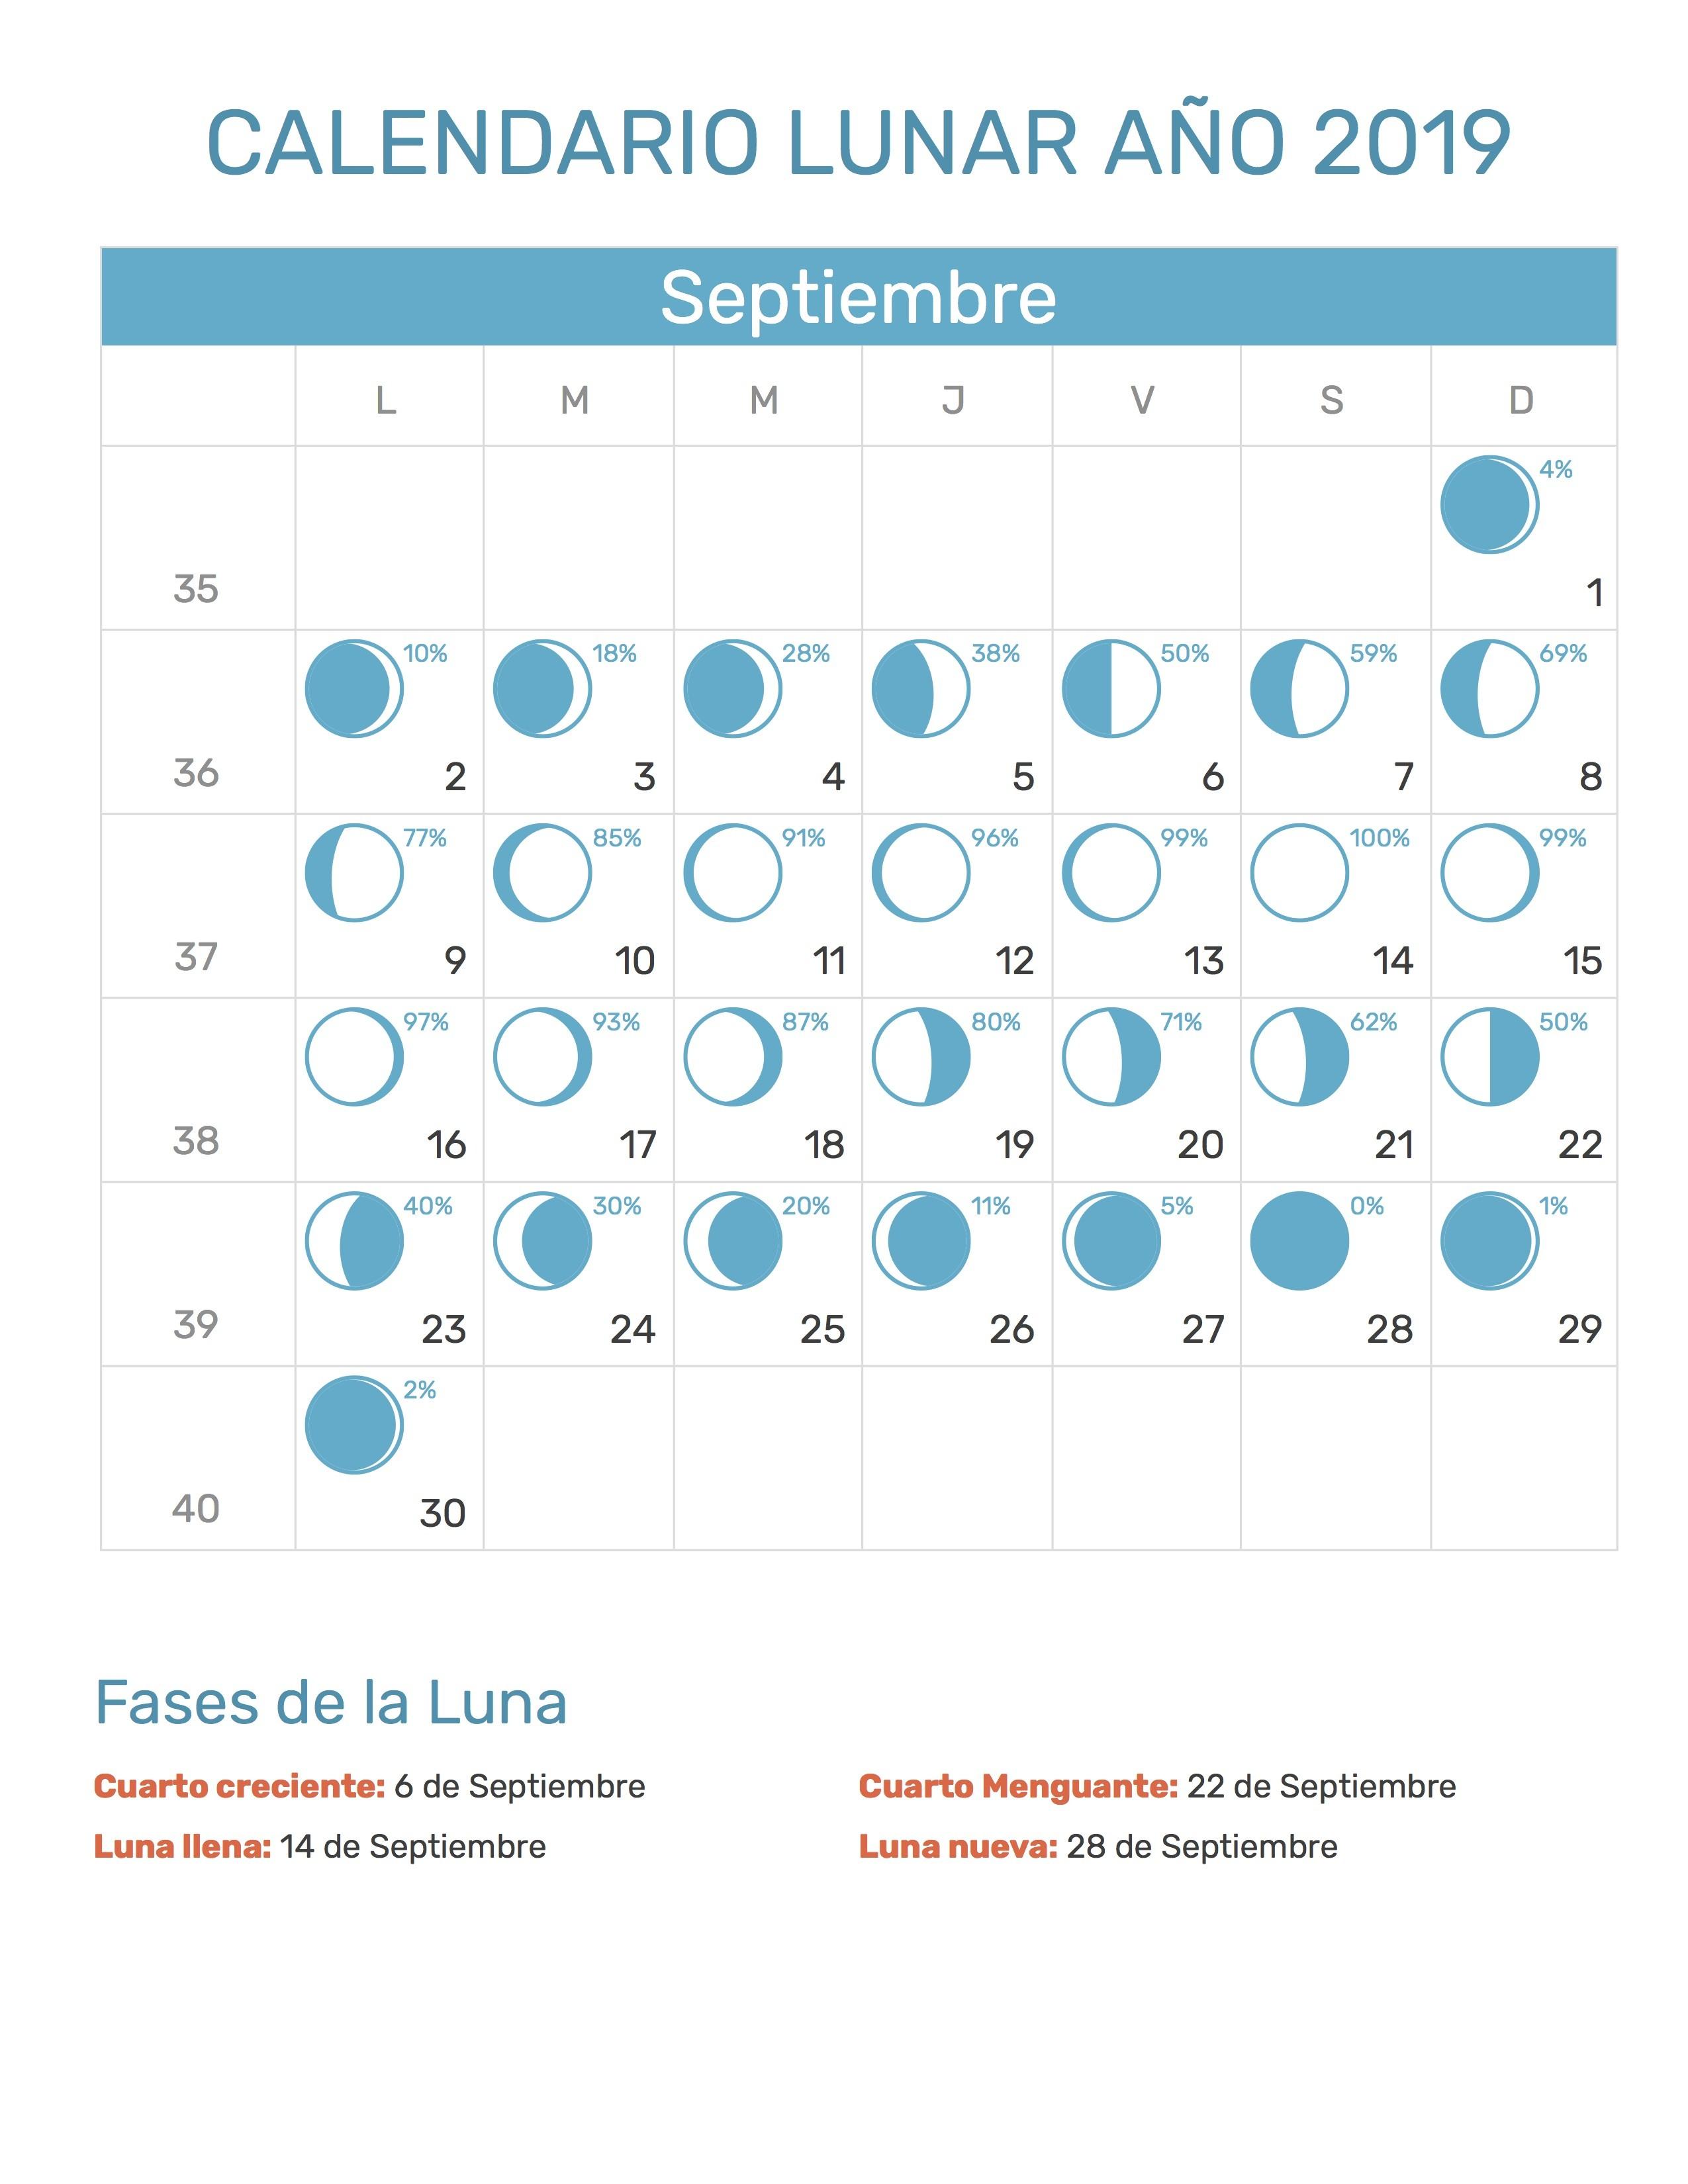 Imprimir Calendario Julio Agosto Y Septiembre 2019 Más Caliente Calendario Lunar Septiembre 2019 Of Imprimir Calendario Julio Agosto Y Septiembre 2019 Más Recientes 12 Calendarios De Descarga Gratis Calendarios 2016 Para Imprimir